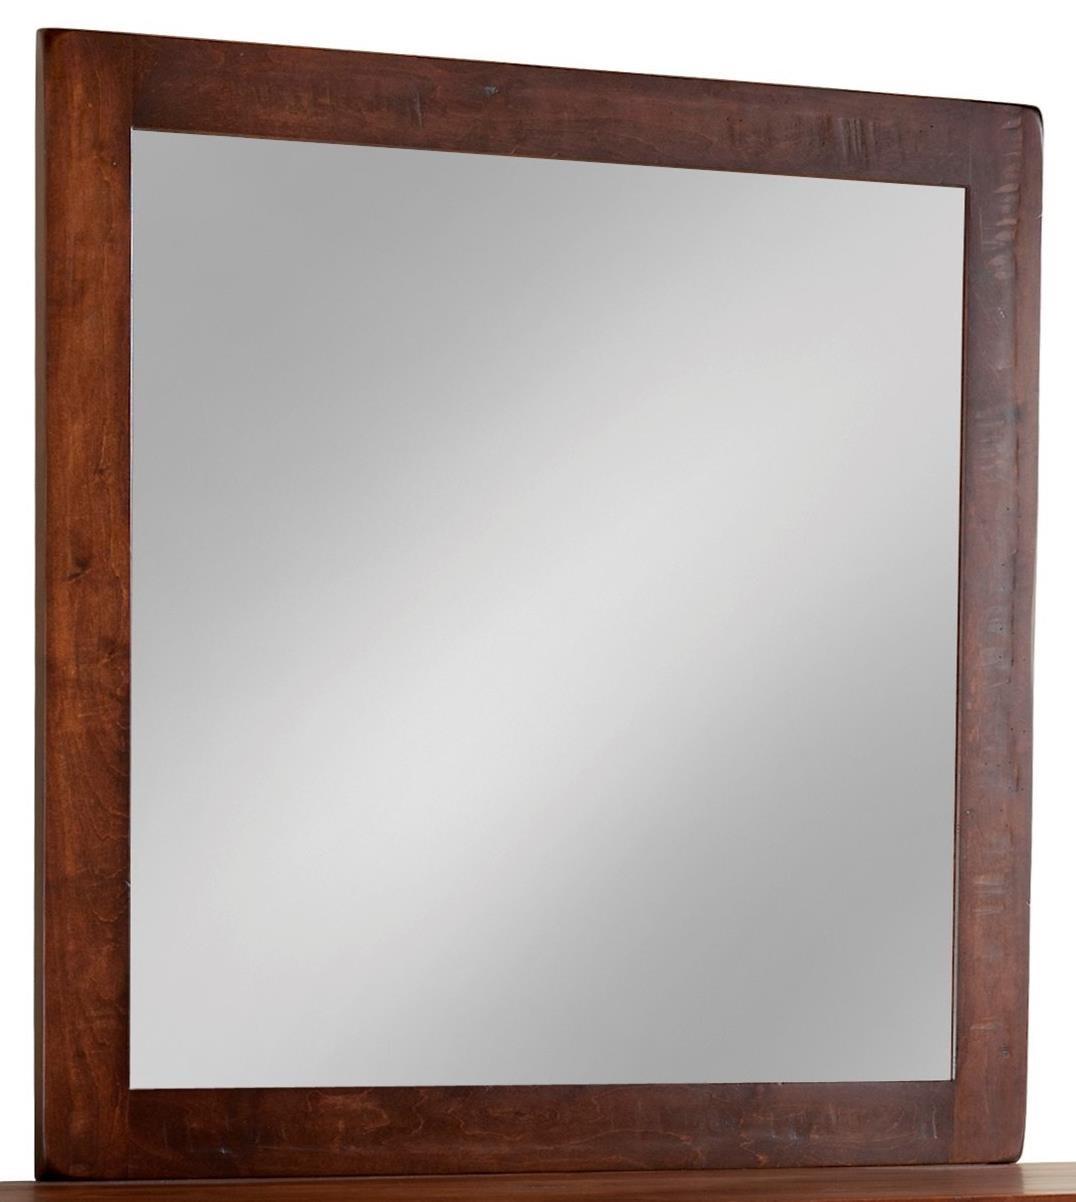 Lewiston Dresser Mirror by Daniel's Amish at H.L. Stephens